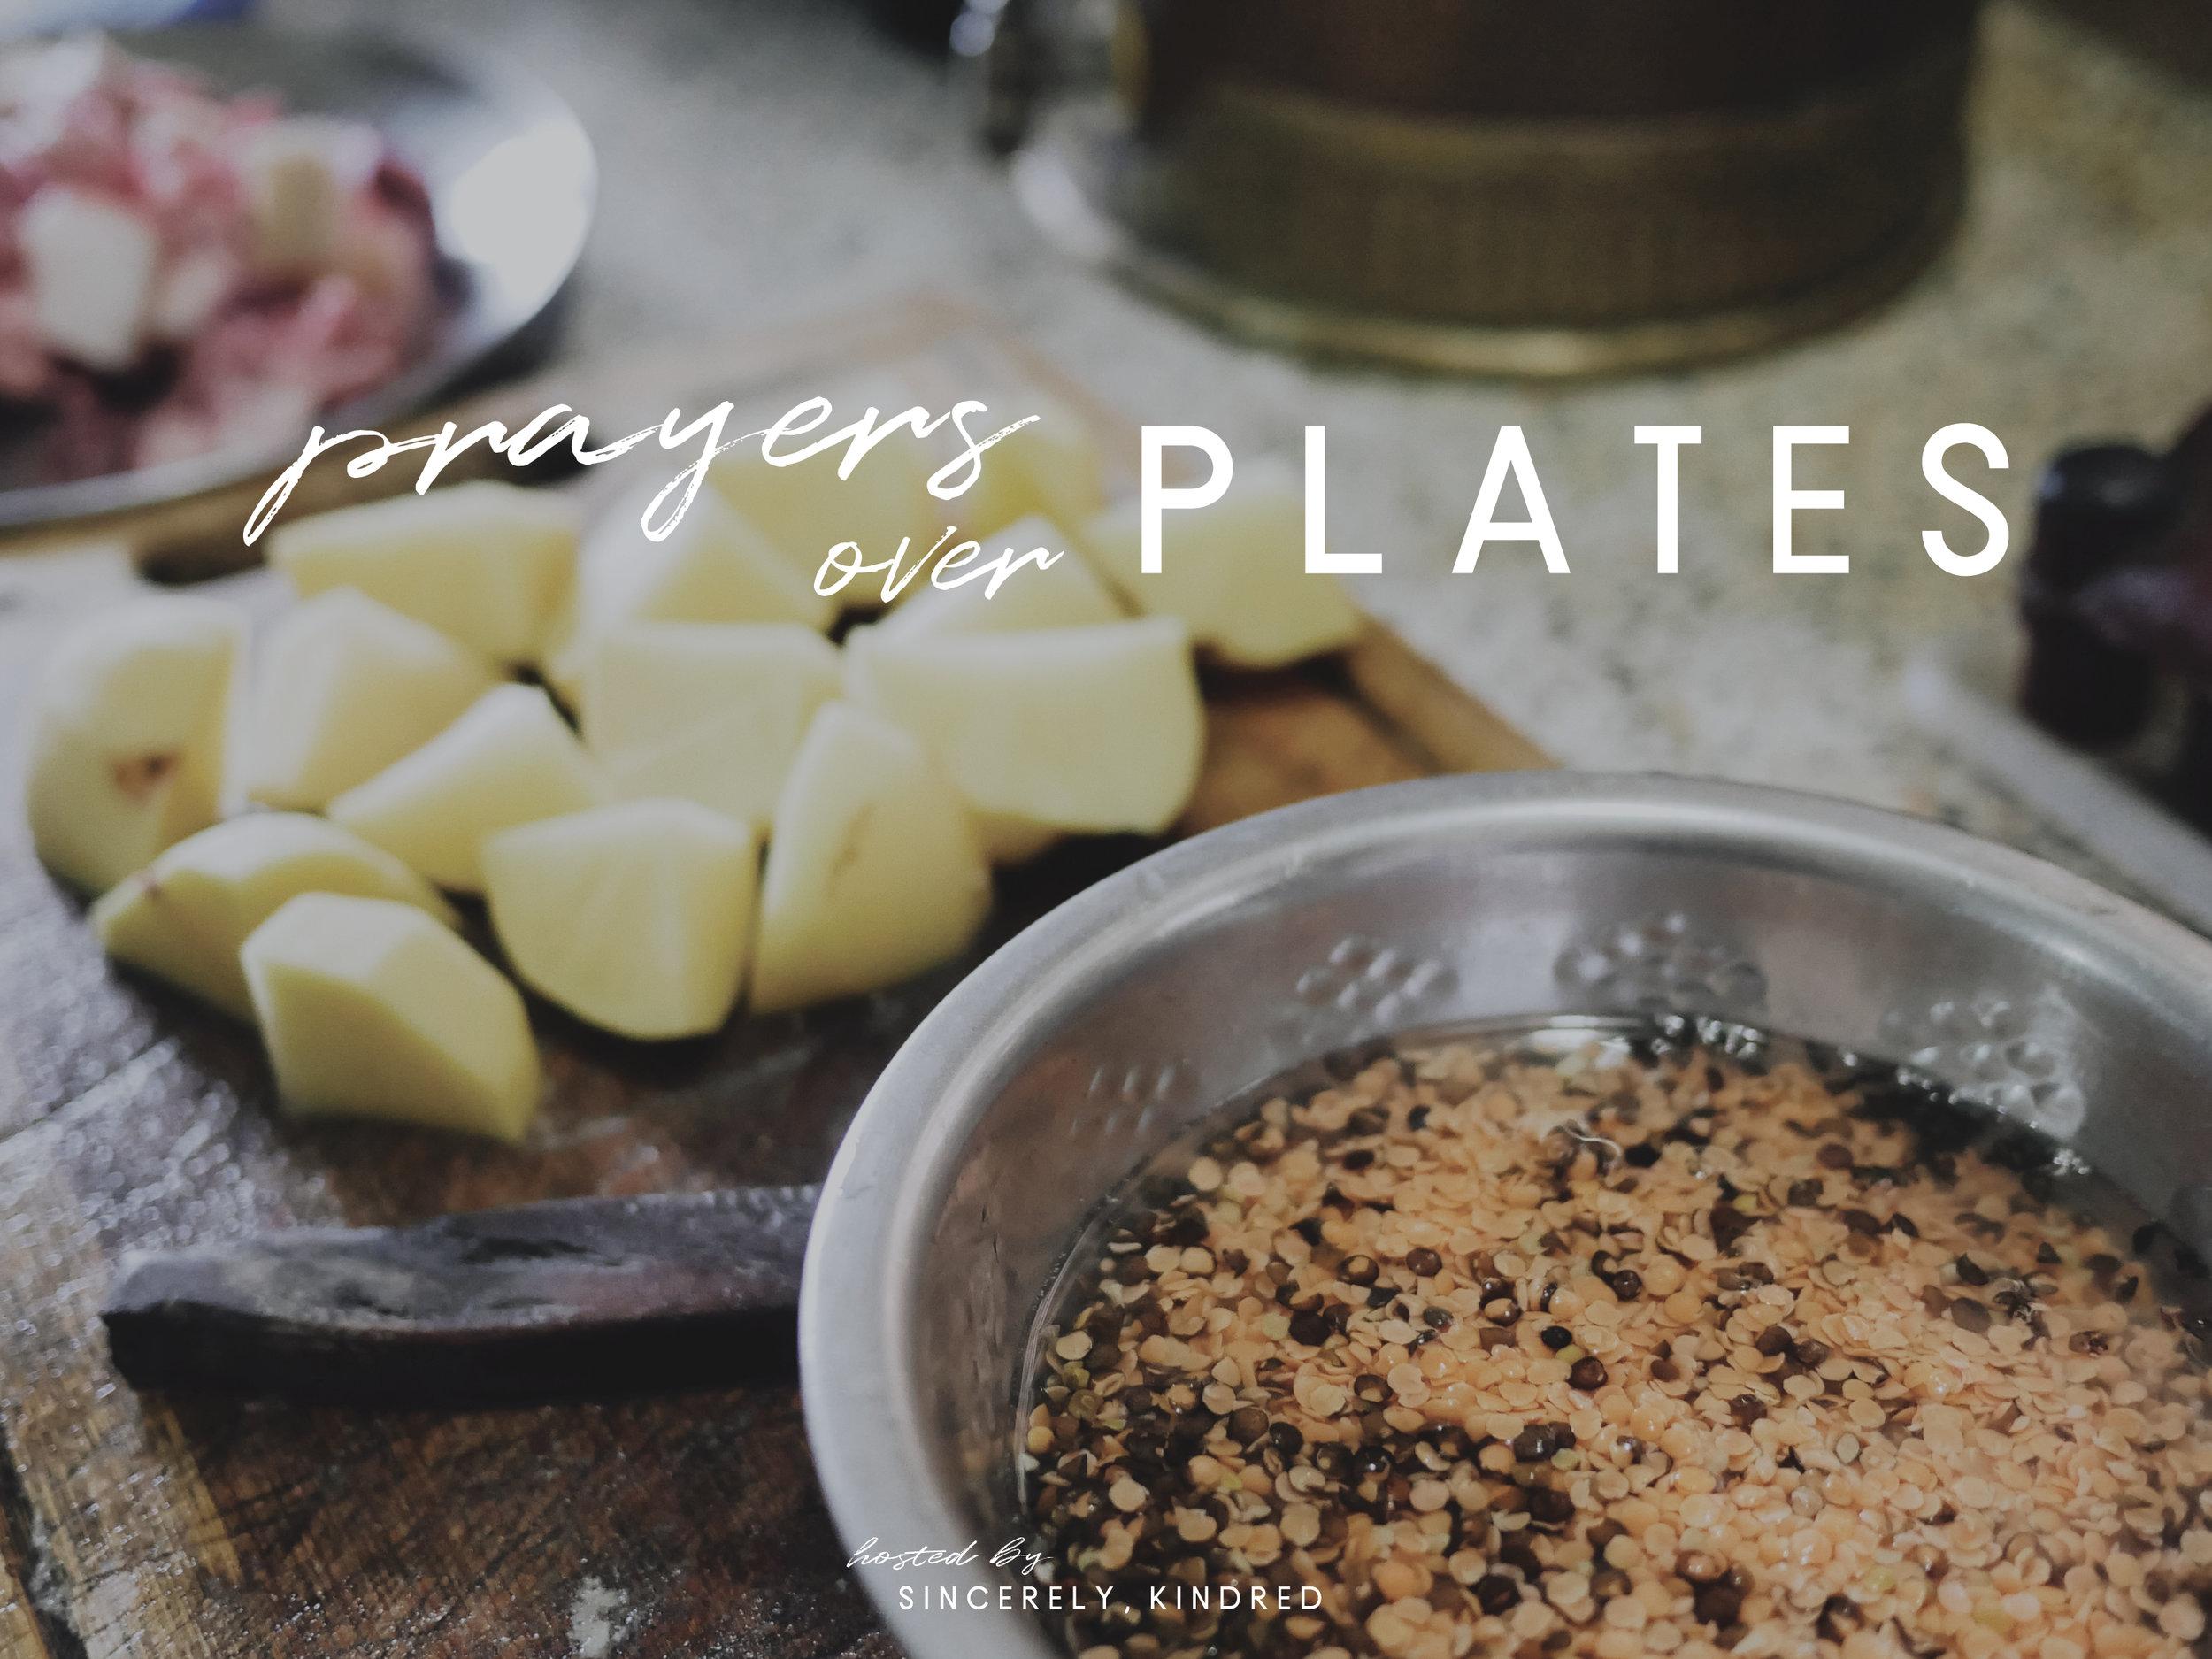 prayers over plates sea image.jpg